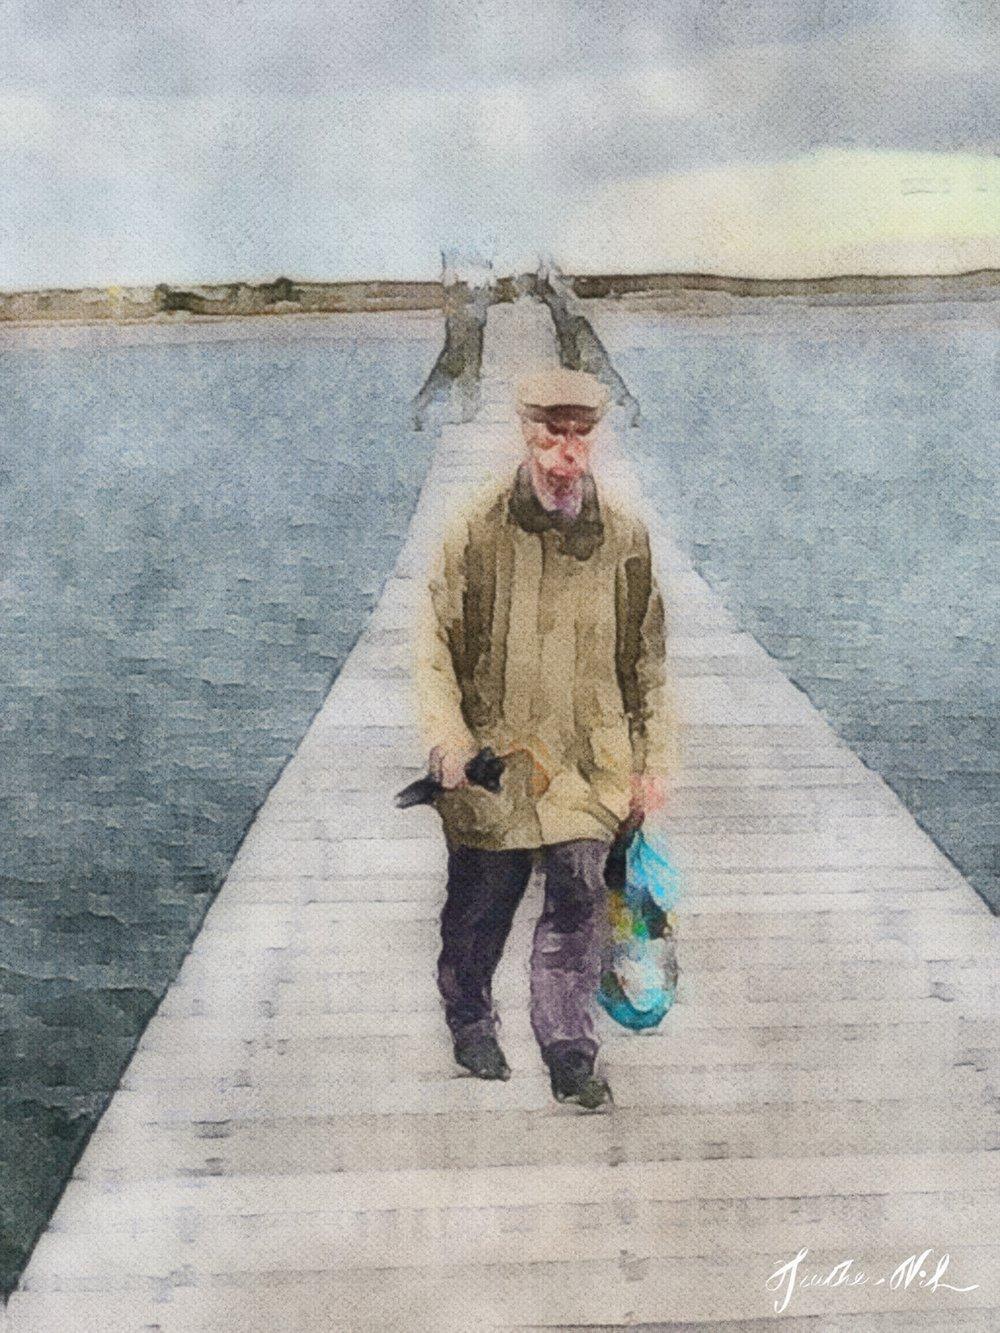 Harold on the boardwalk in Sandwich, MA - iPhone XS Max, Procreate, iColorama